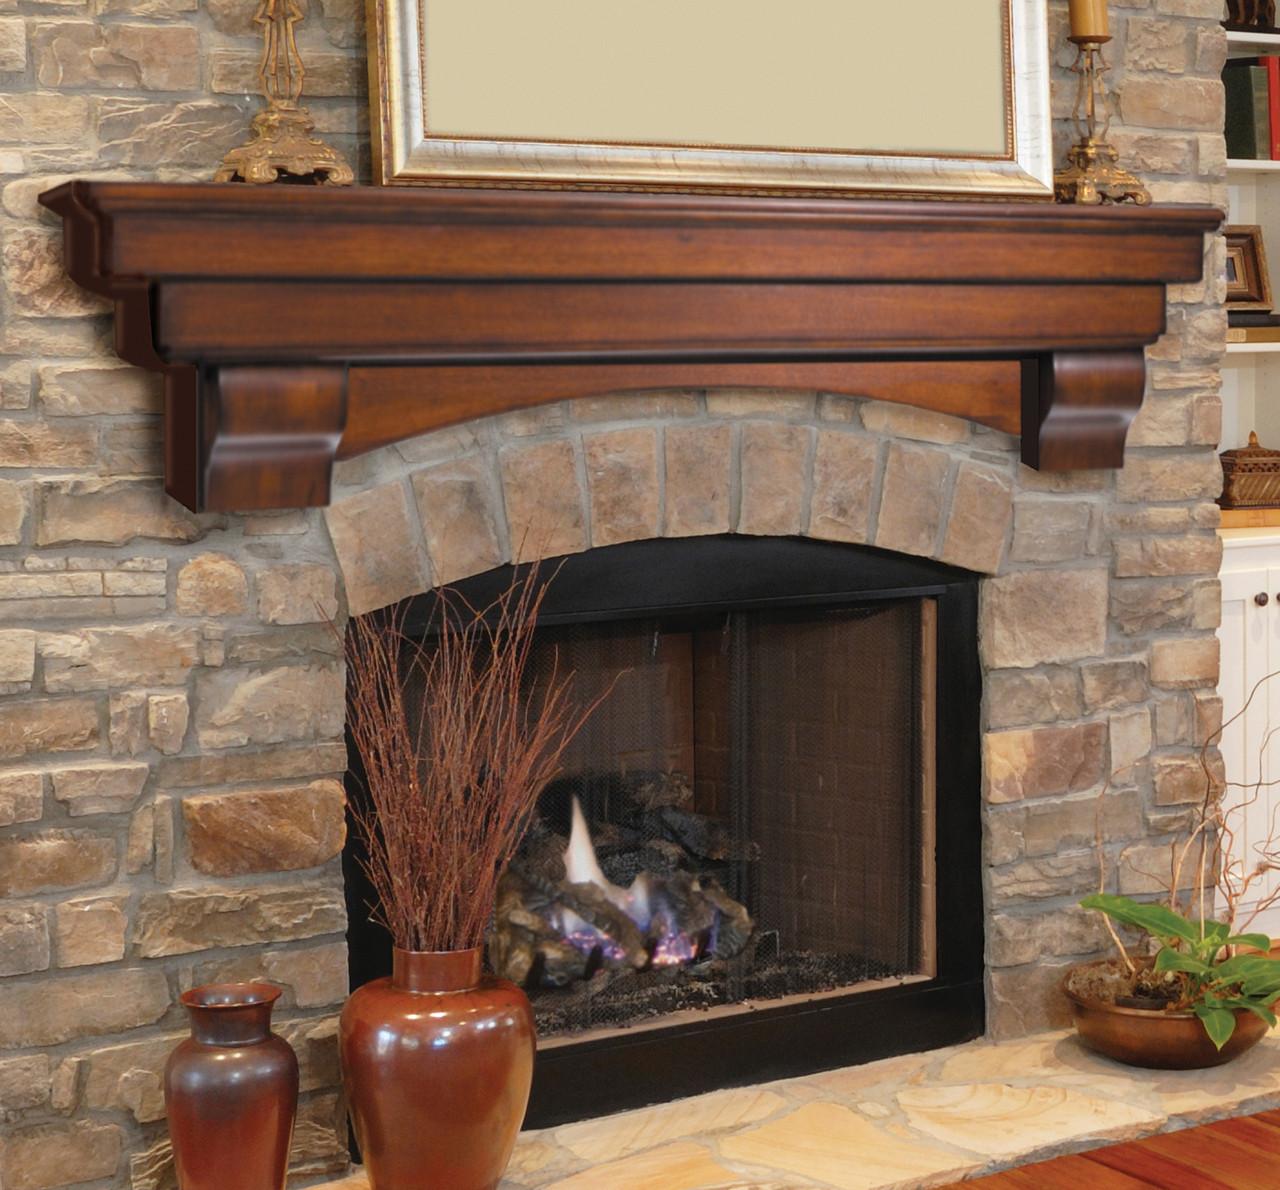 The Auburn 495 Fireplace Mantel Shelf, Life Style View 3